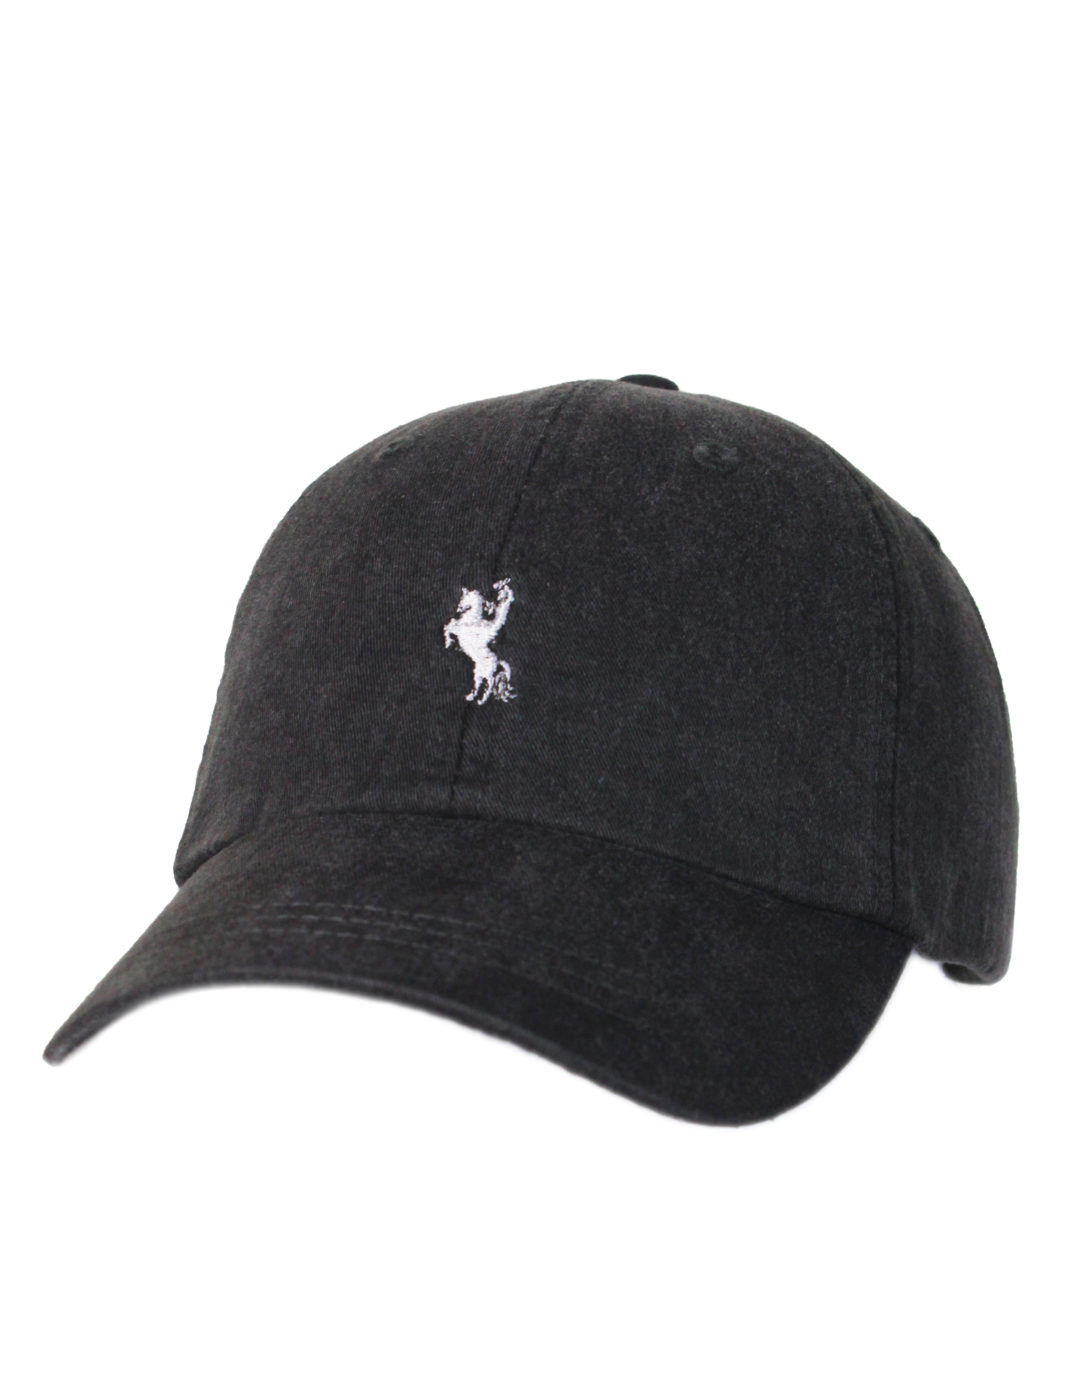 Tarleton Adjustable Cap